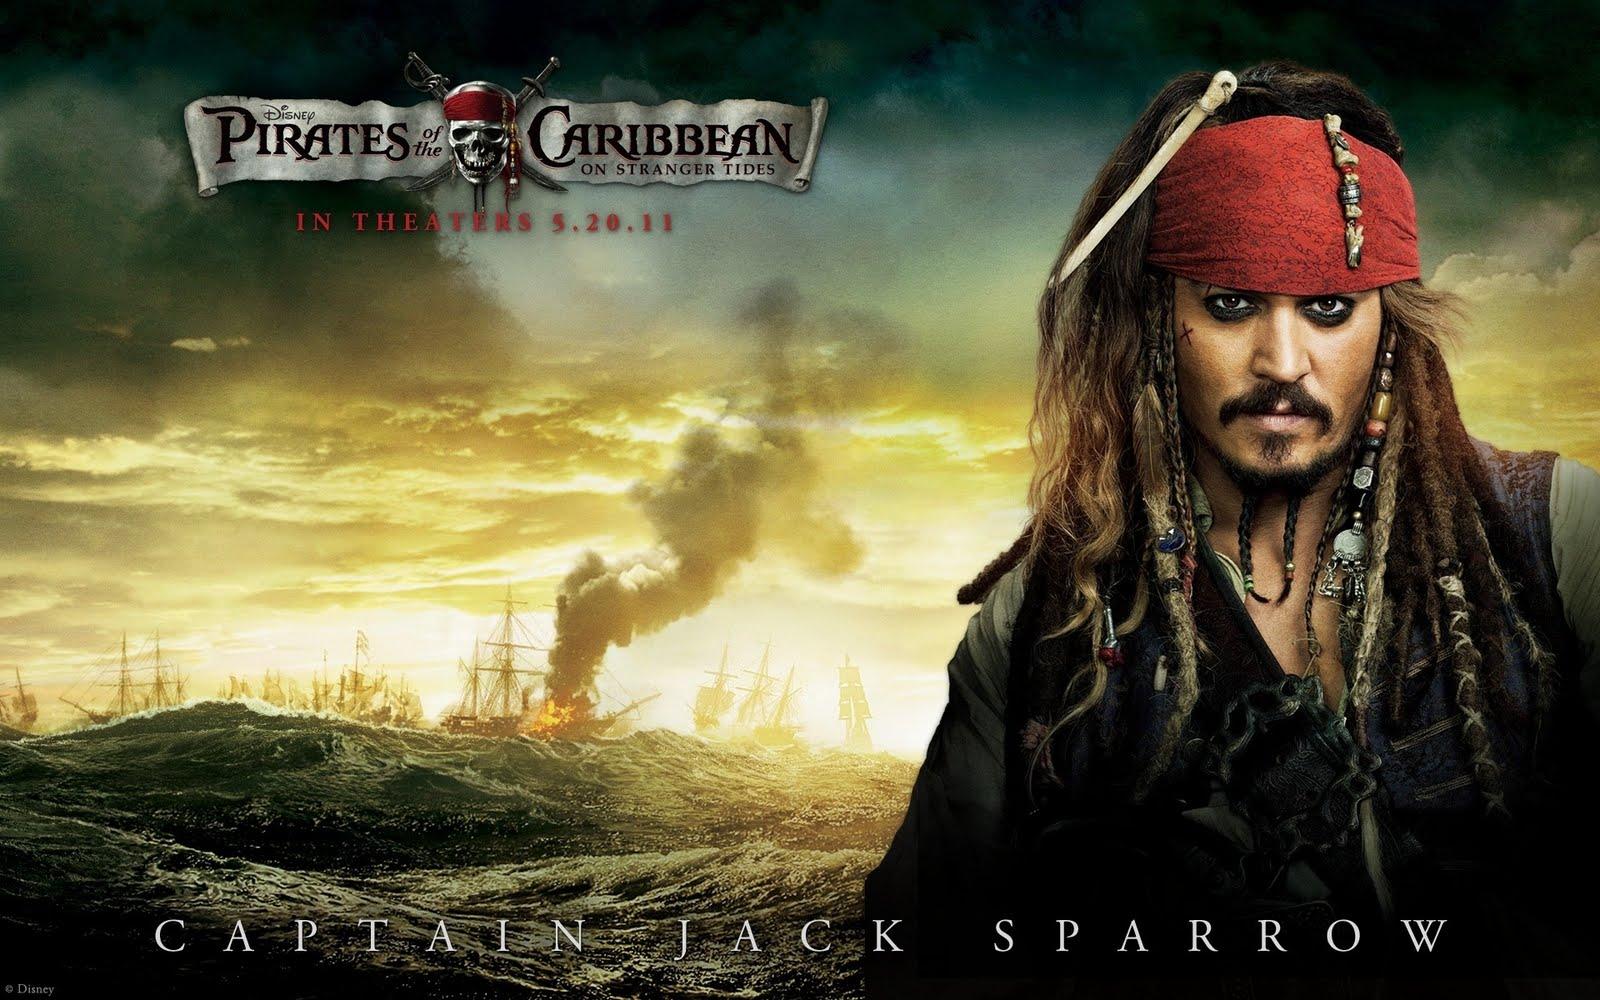 http://4.bp.blogspot.com/-Pmy6idRuHxw/TeU6U8aqmkI/AAAAAAAAA_k/Nd6ltCpDWao/s1600/Pirates-of-the-Caribbean-4-Wallpaper-Movie-Wallpaper-4.jpg